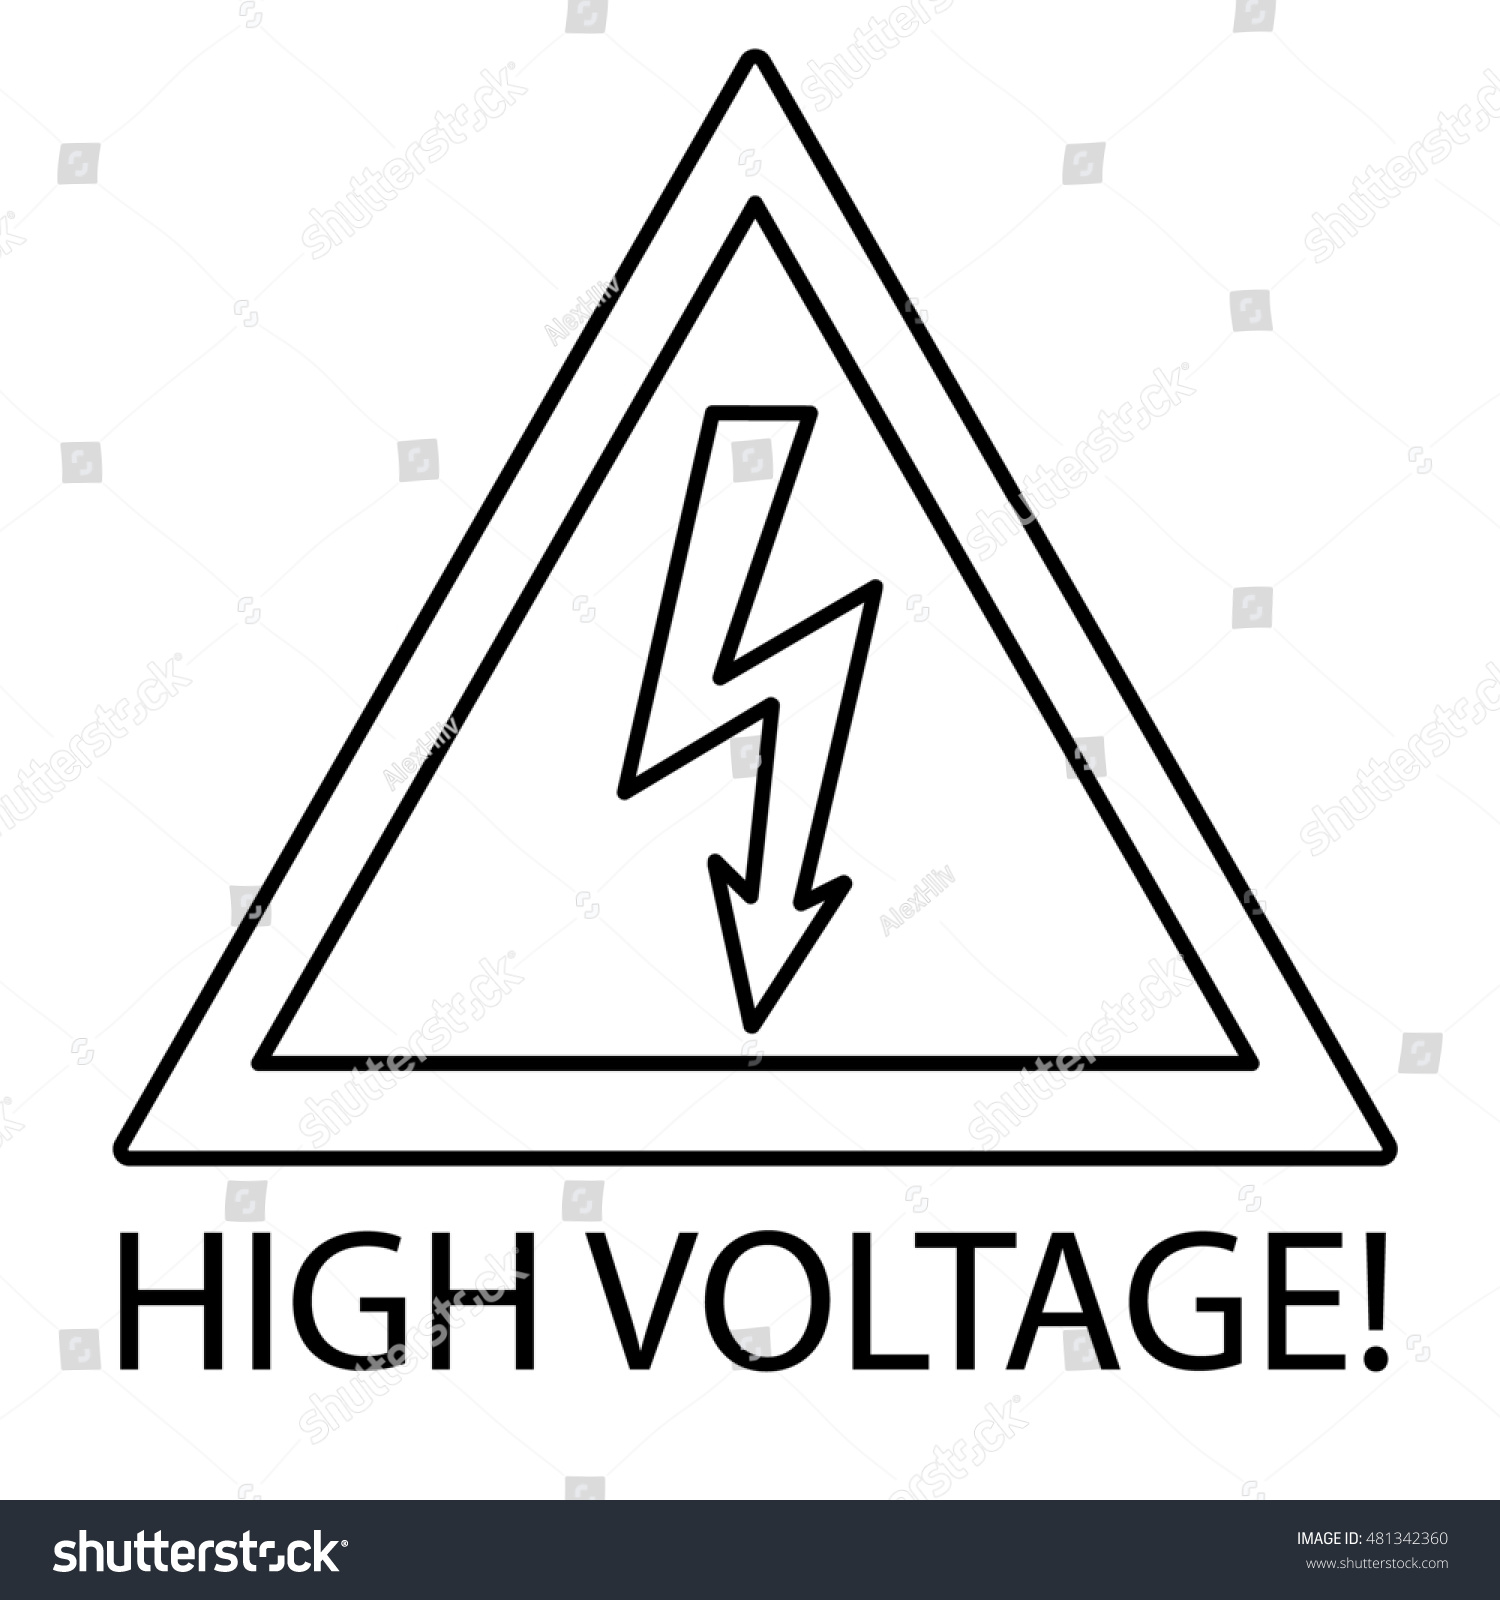 High voltage sign danger symbol flat stock illustration 481342360 high voltage sign danger symbol flat stock illustration black and white buycottarizona